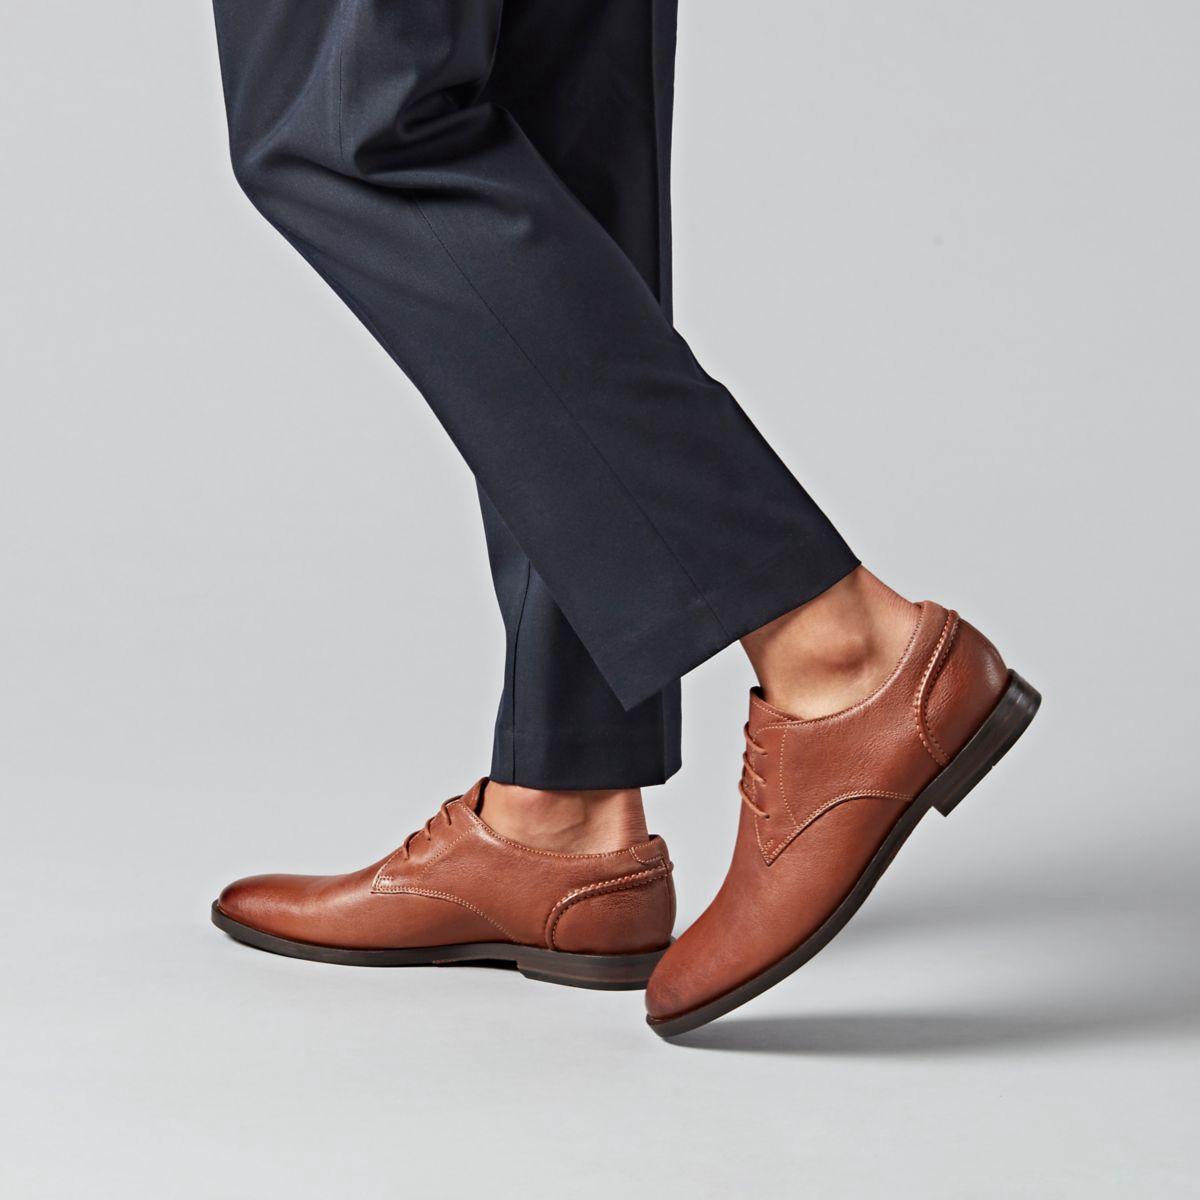 Clarks Glide Lace - Mens Shoes Tan